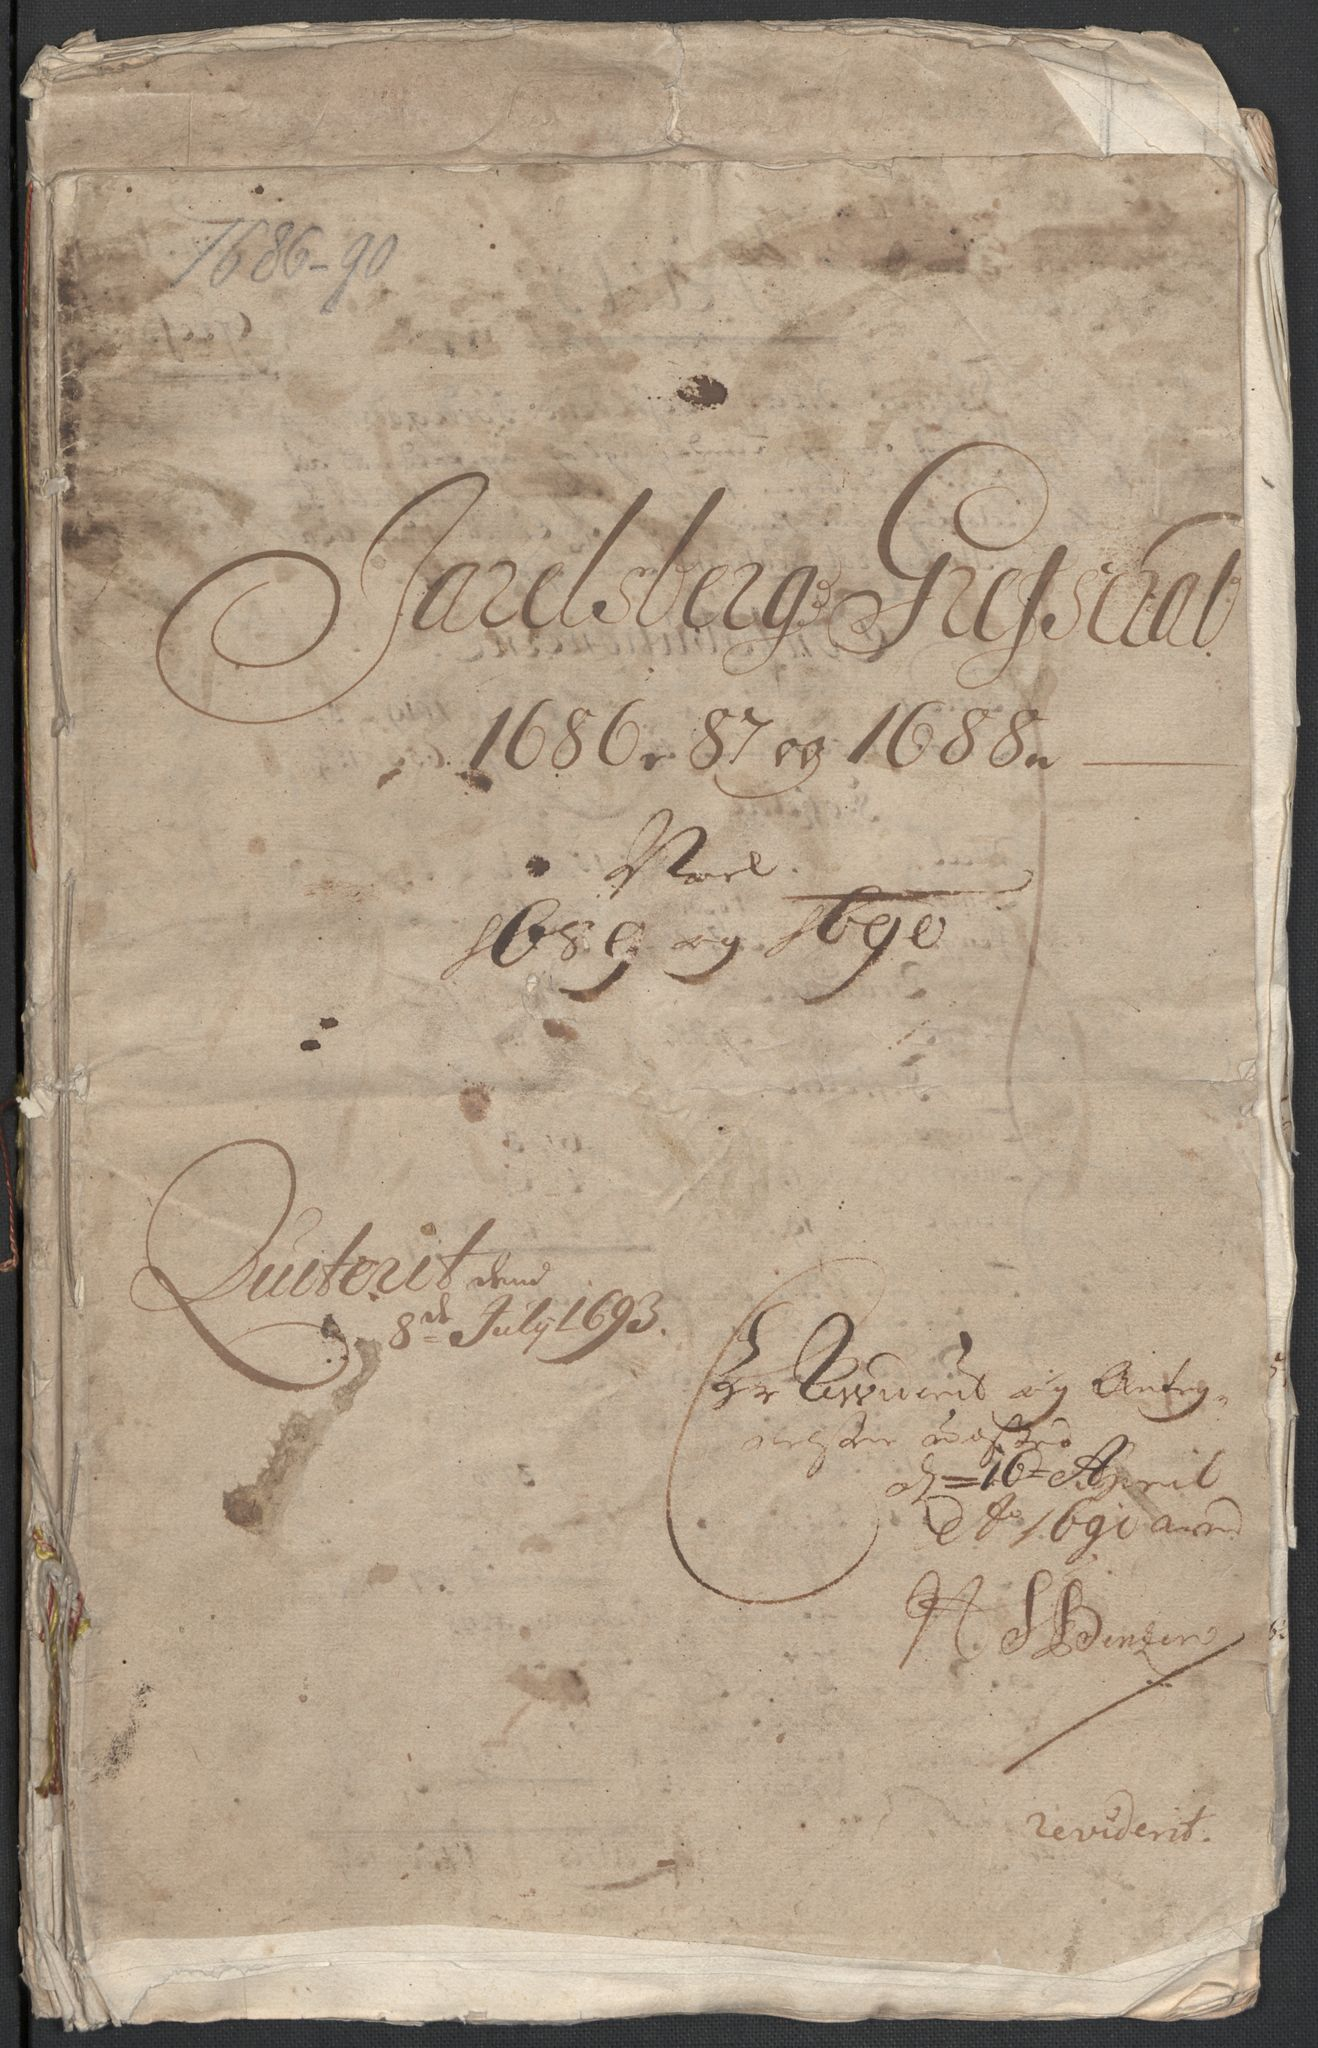 RA, Rentekammeret inntil 1814, Reviderte regnskaper, Fogderegnskap, R32/L1857: Fogderegnskap Jarlsberg grevskap, 1686-1690, s. 1